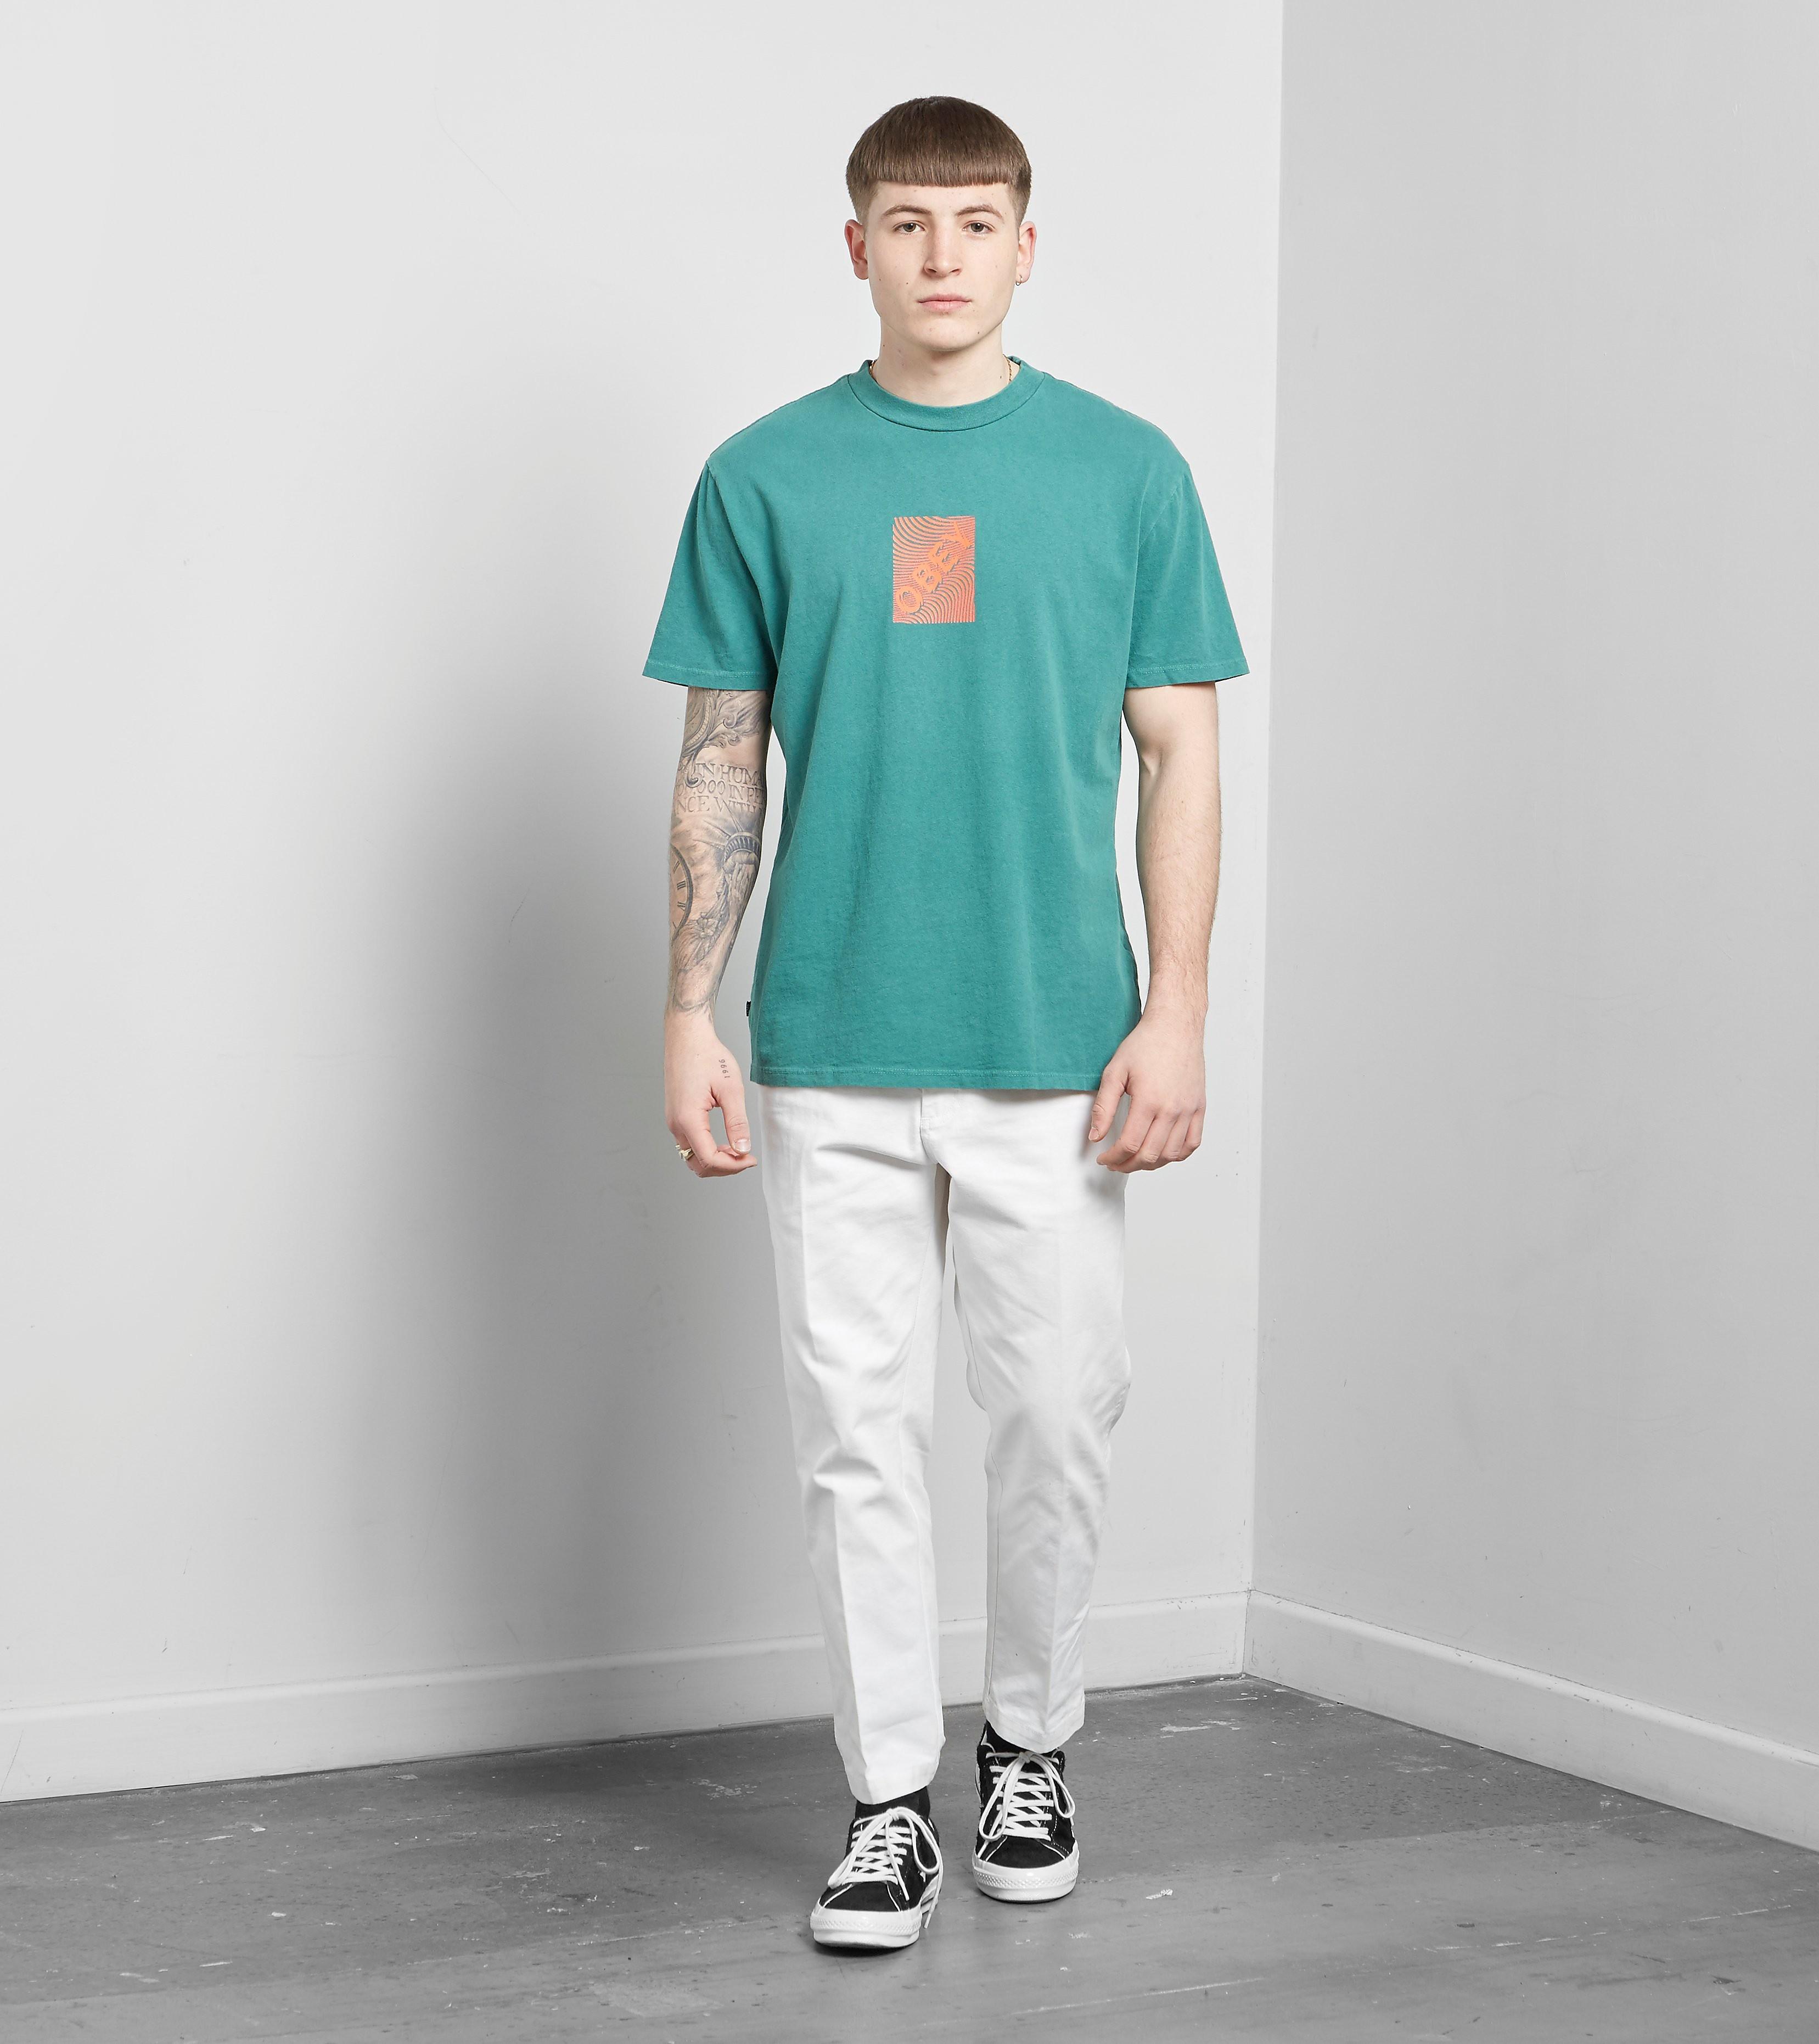 Obey Swirl T-Shirt